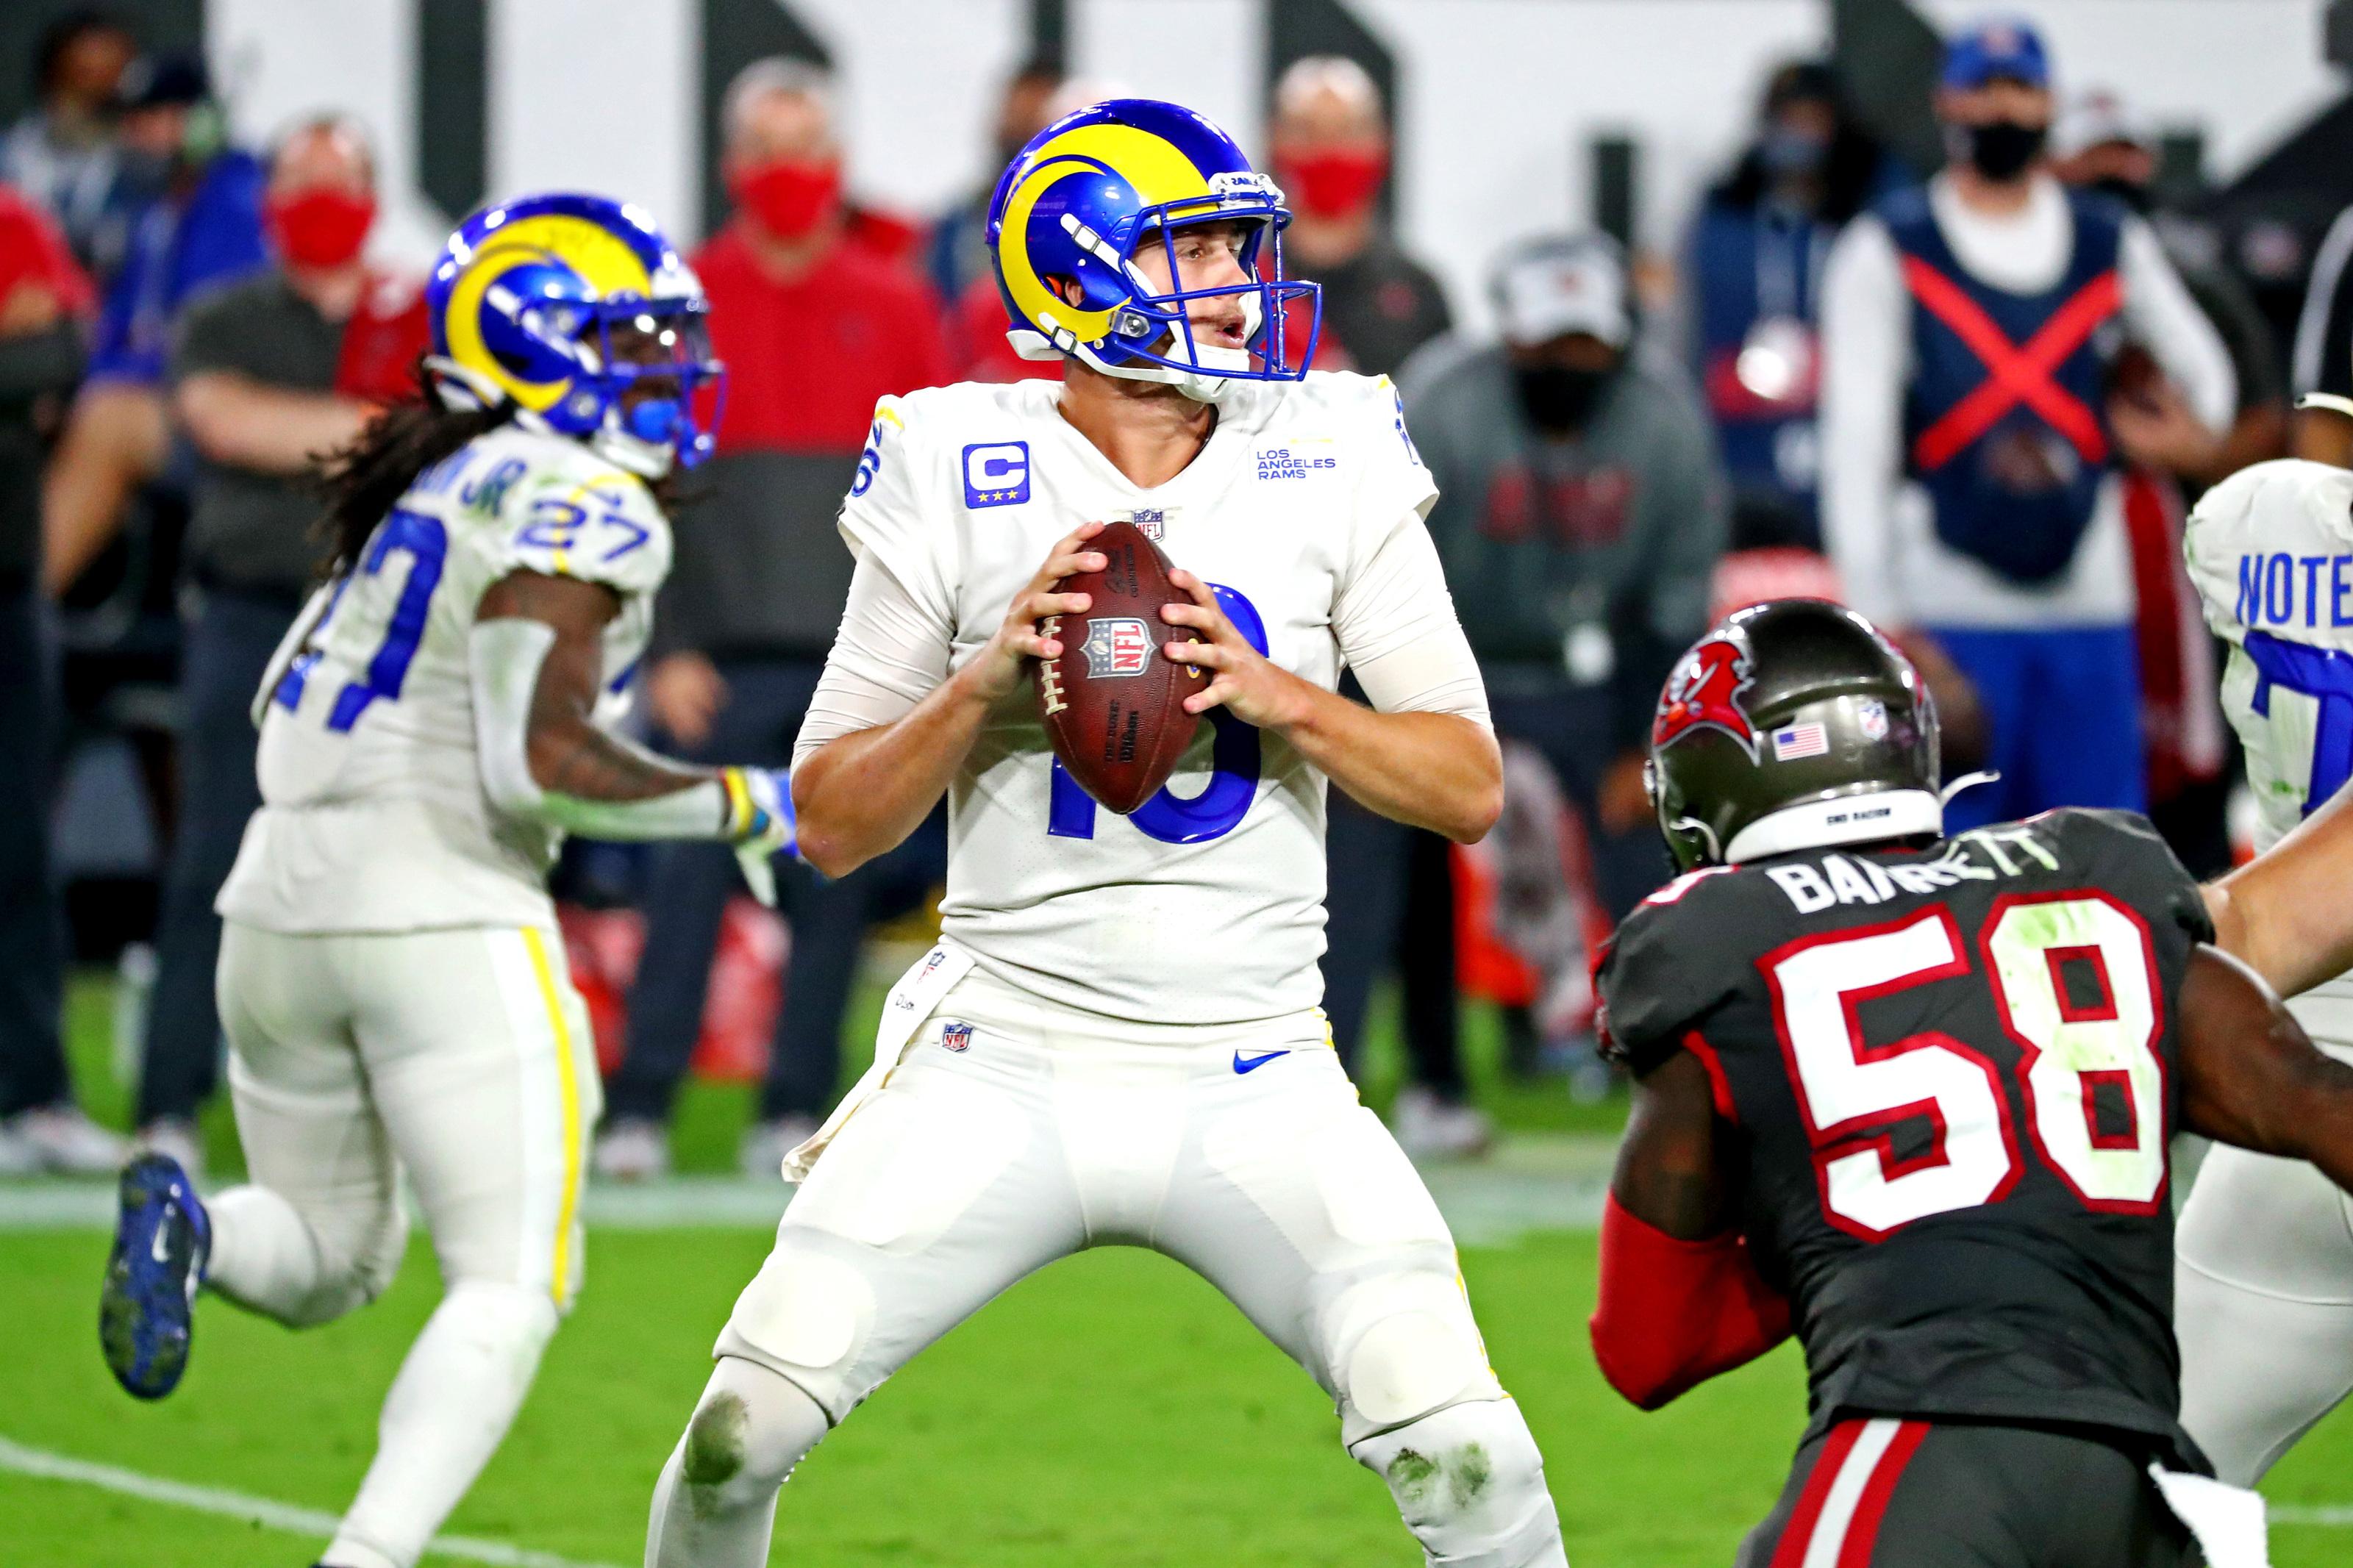 Nfc Playoff Scenarios Week 15 Rams Bucs Can Clinch Berths